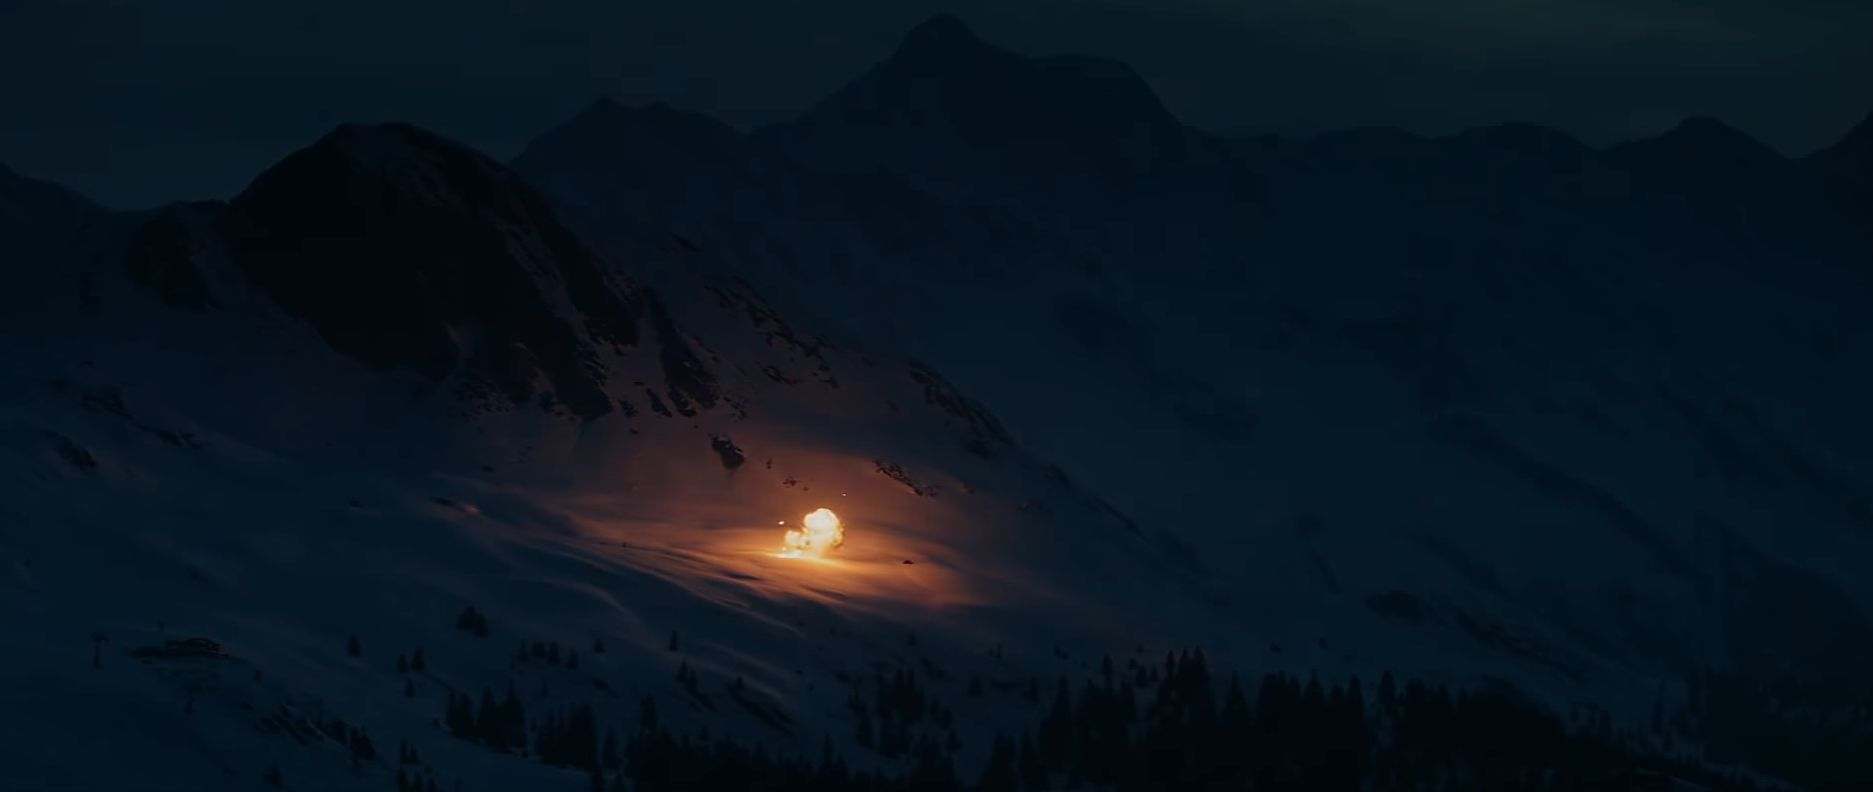 Angriff der Lederhosenzombies- Snowboard-Film